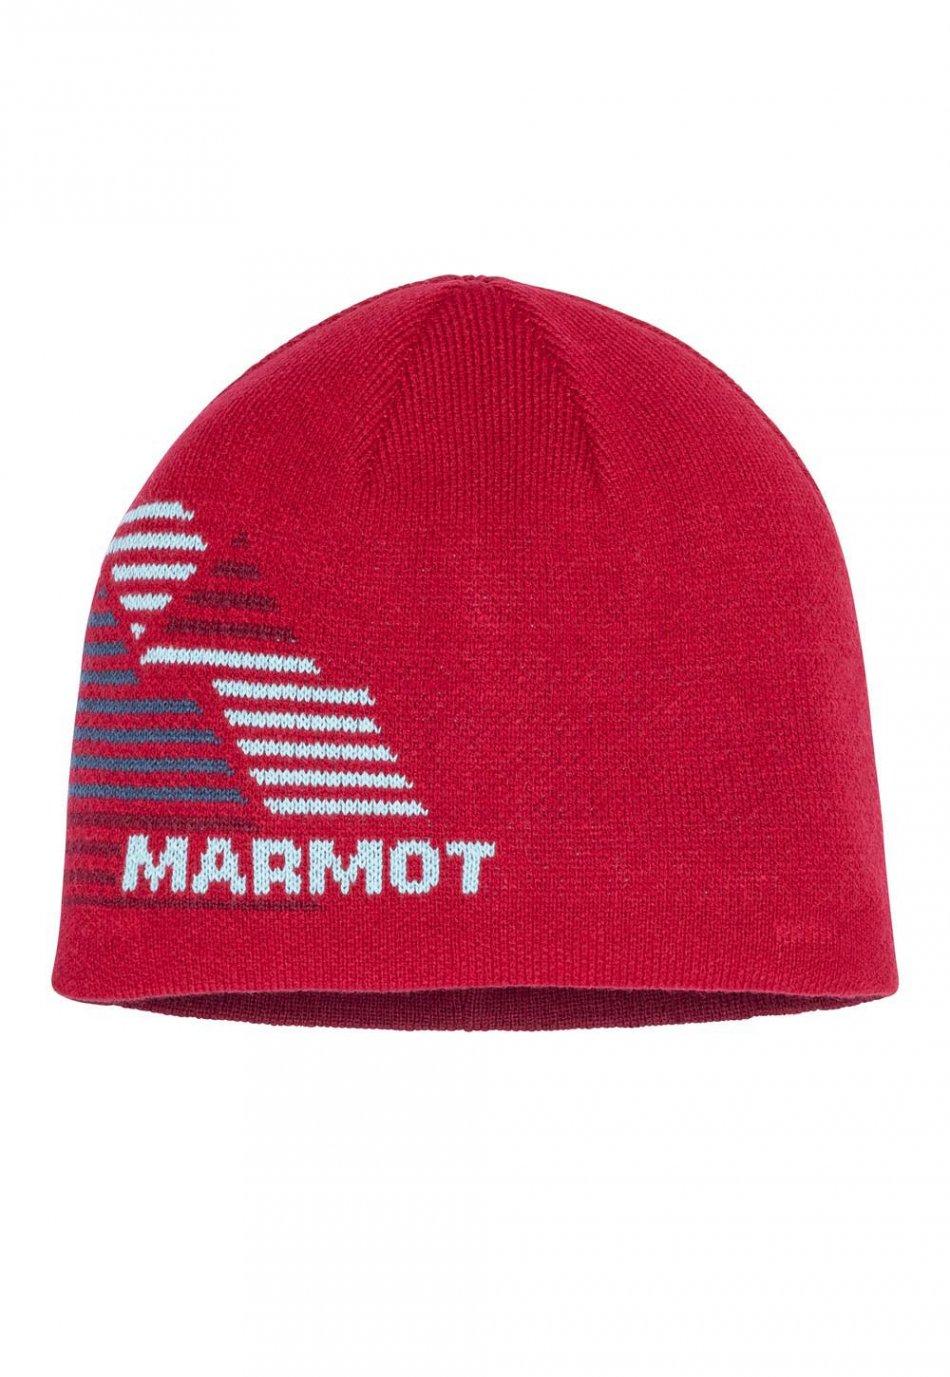 Marmot Novelty Rvsble Beanie Boys Team Red 139506278